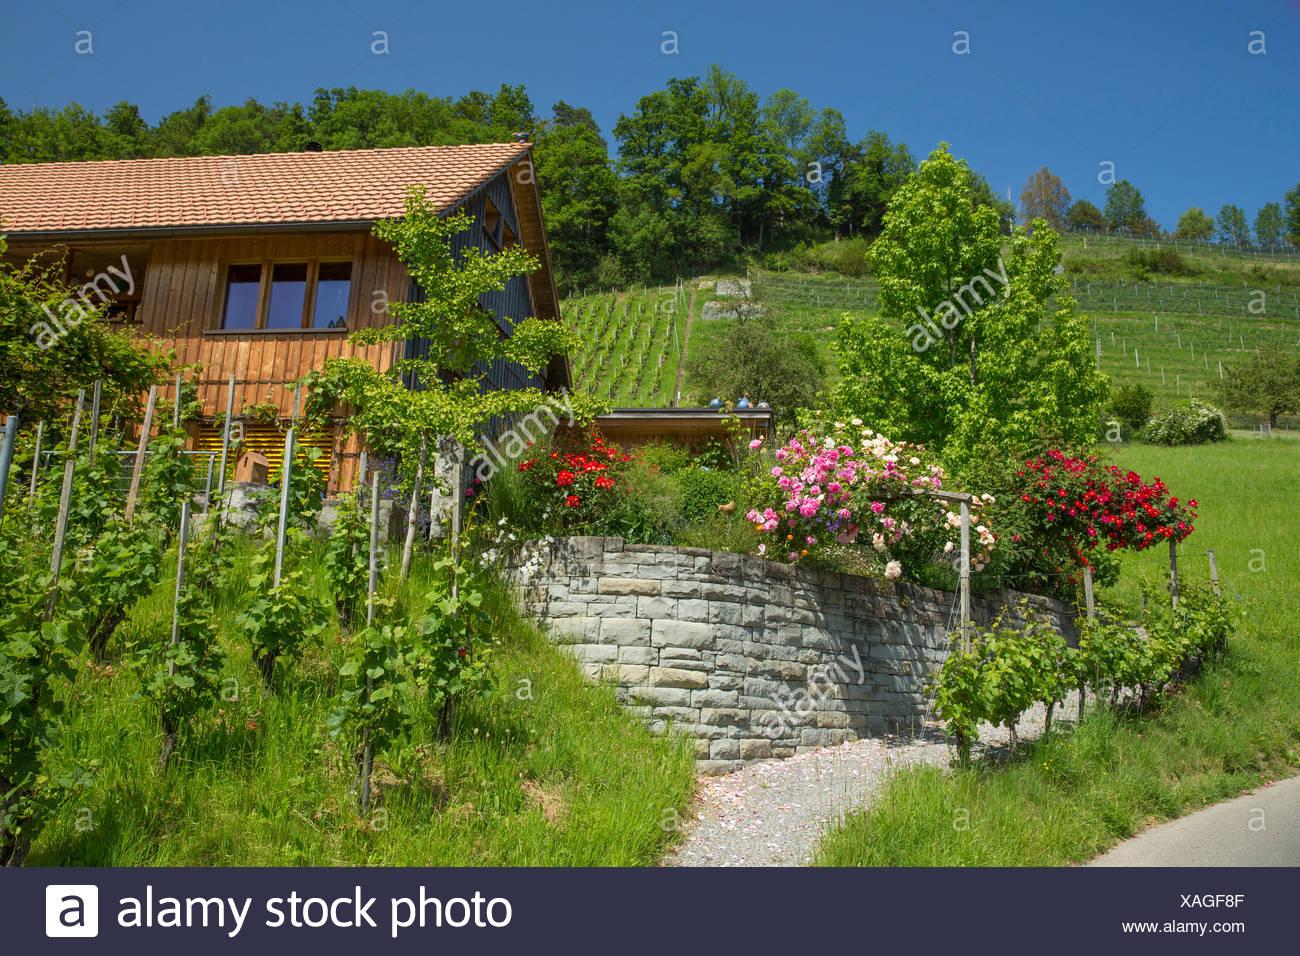 houses, homes, Wienacht-Tobel, canton, Appenzell, Ausserrhoden, Lutzenberg, Switzerland, Europe, - Stock Image